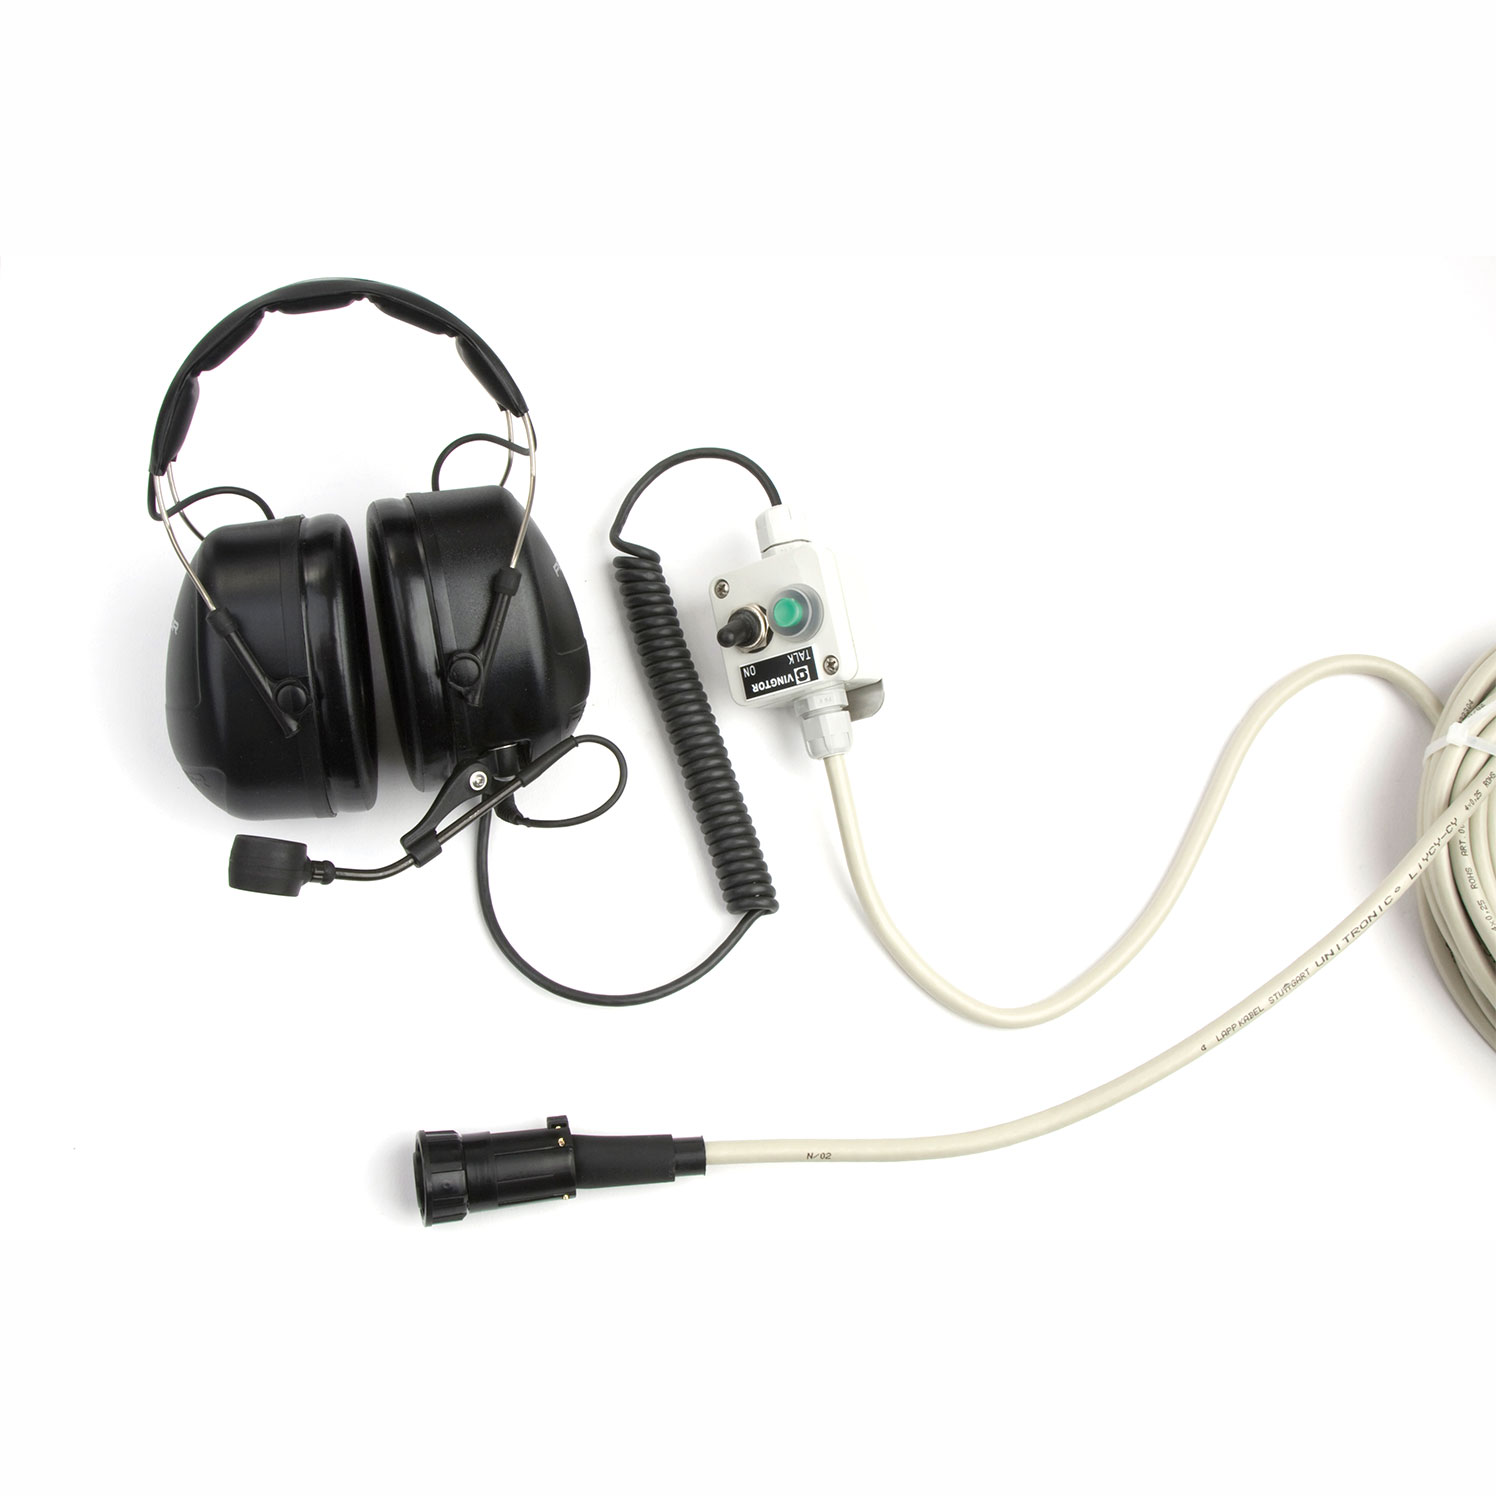 SP5-36-PELP Headset w/ Boom Mic. picture